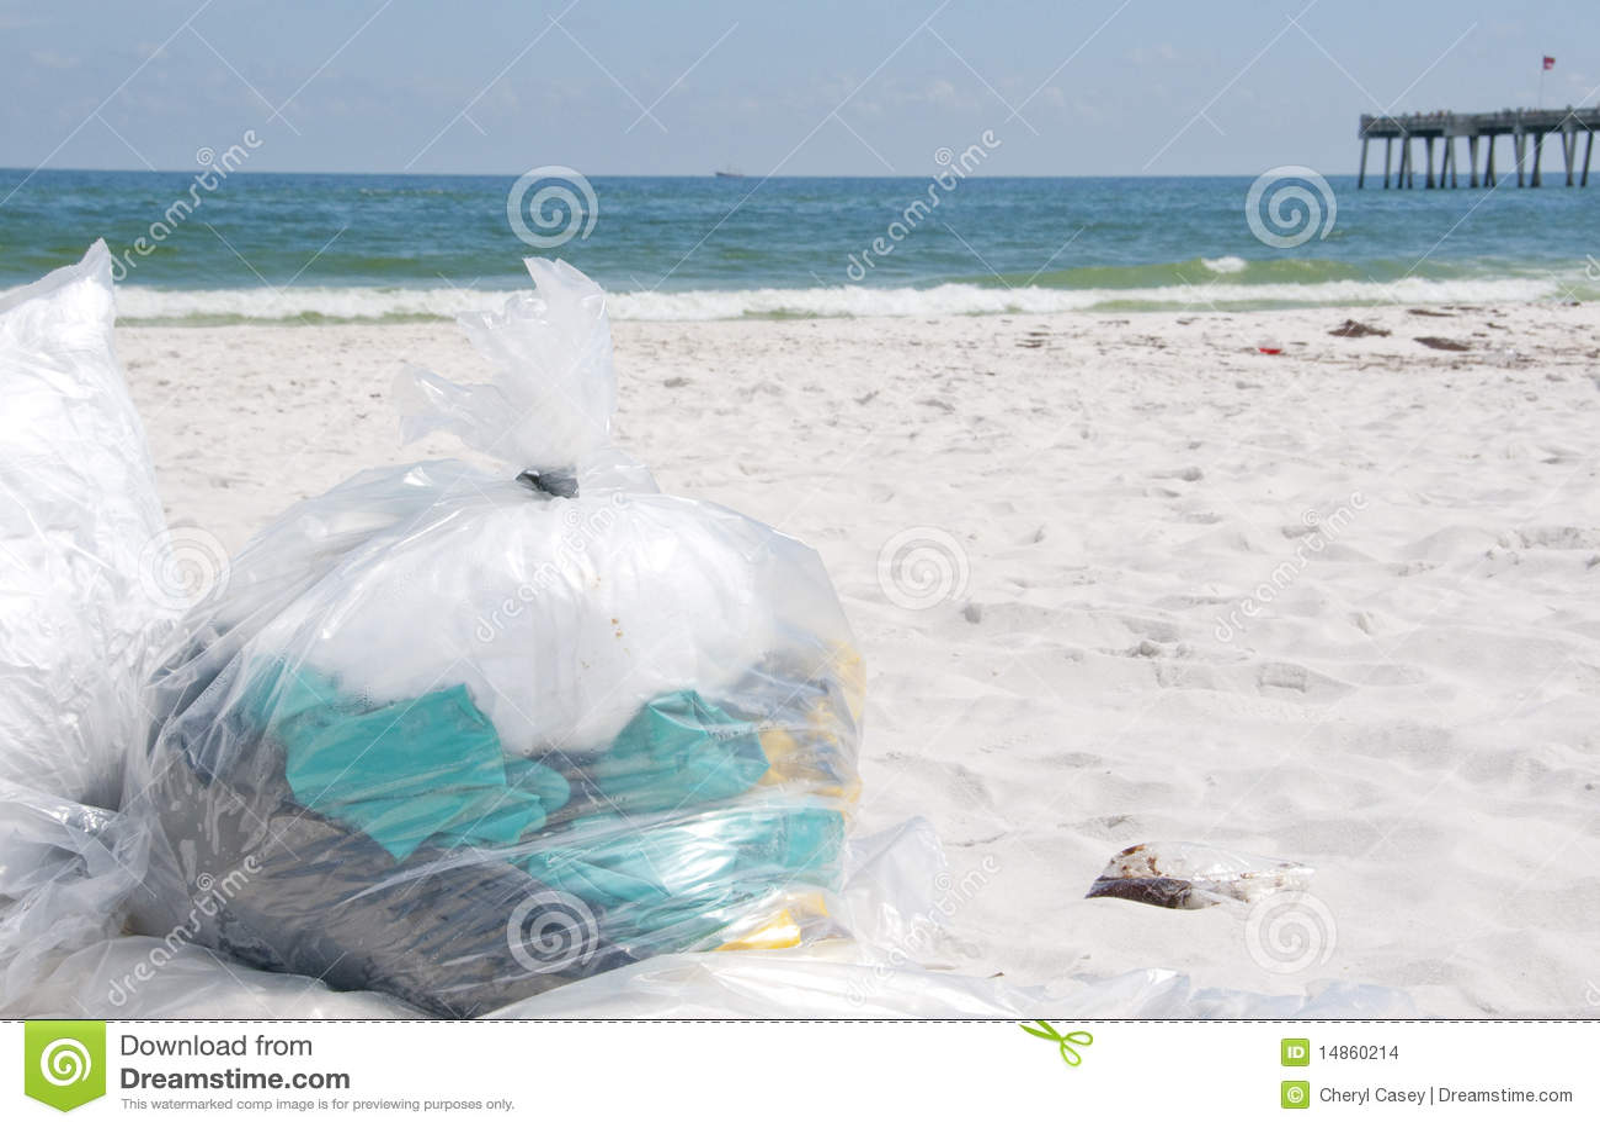 Oil washes ashore in Pensacola Beach